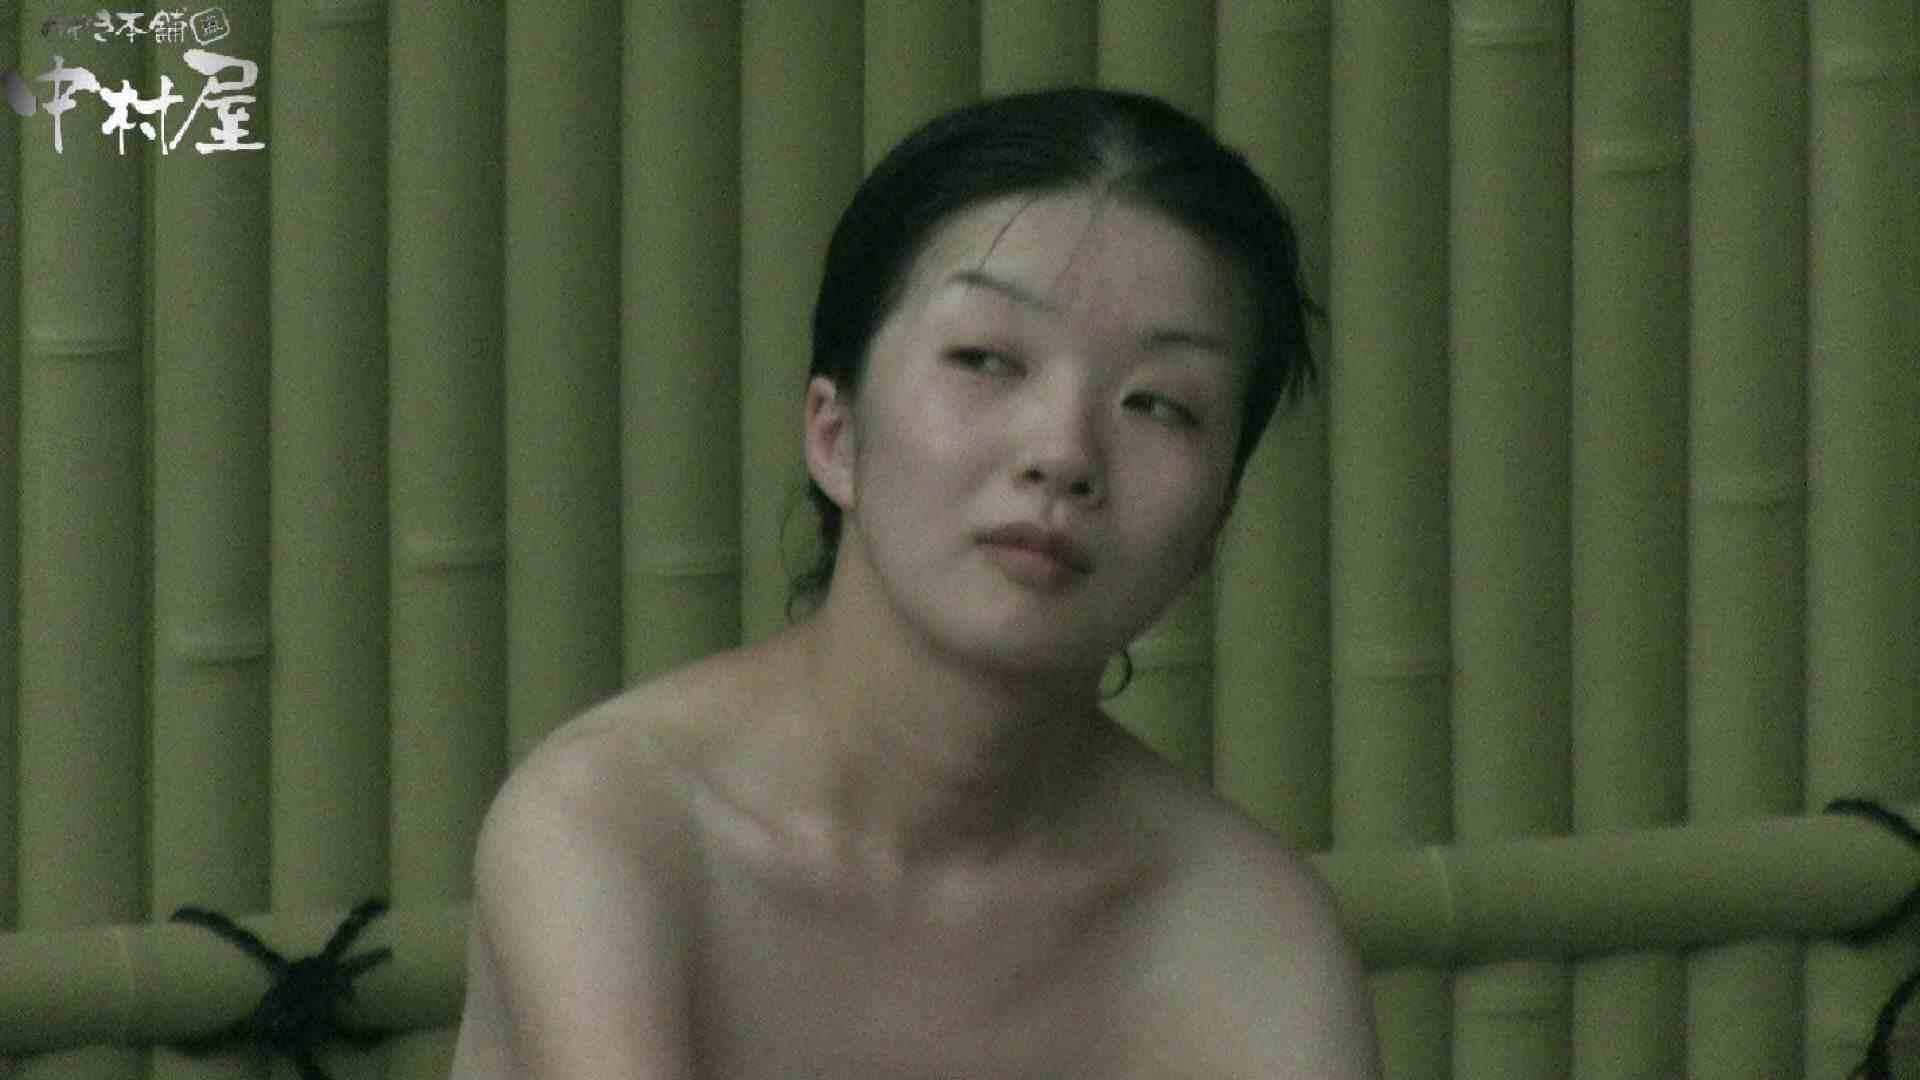 Aquaな露天風呂Vol.904 美しいOLの裸体 オメコ動画キャプチャ 103pic 89